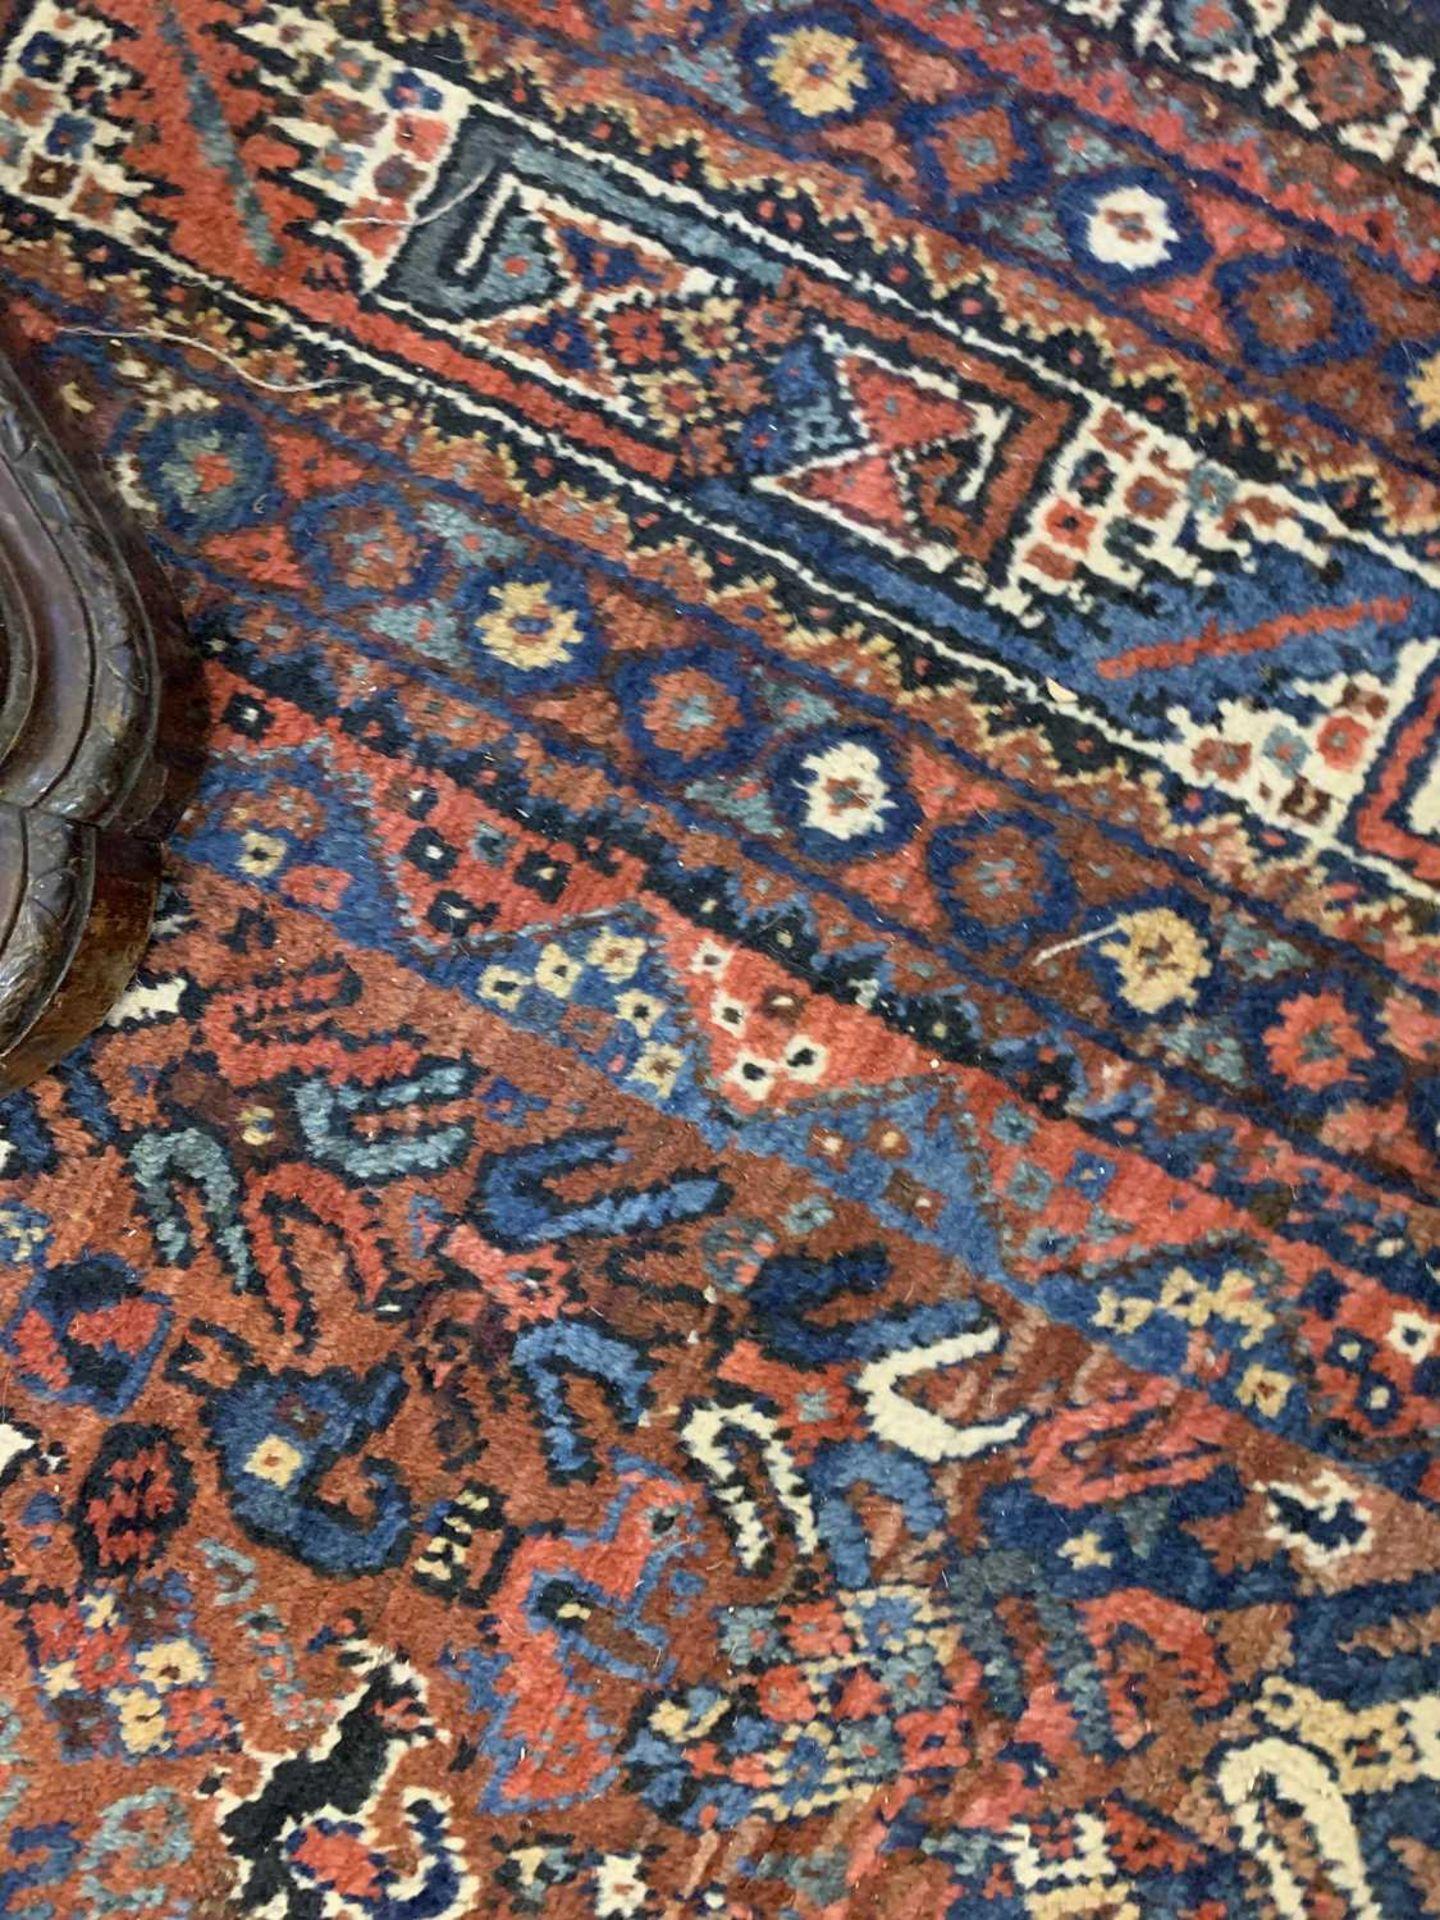 A South West Persian Khamseh carpet, - Image 6 of 17